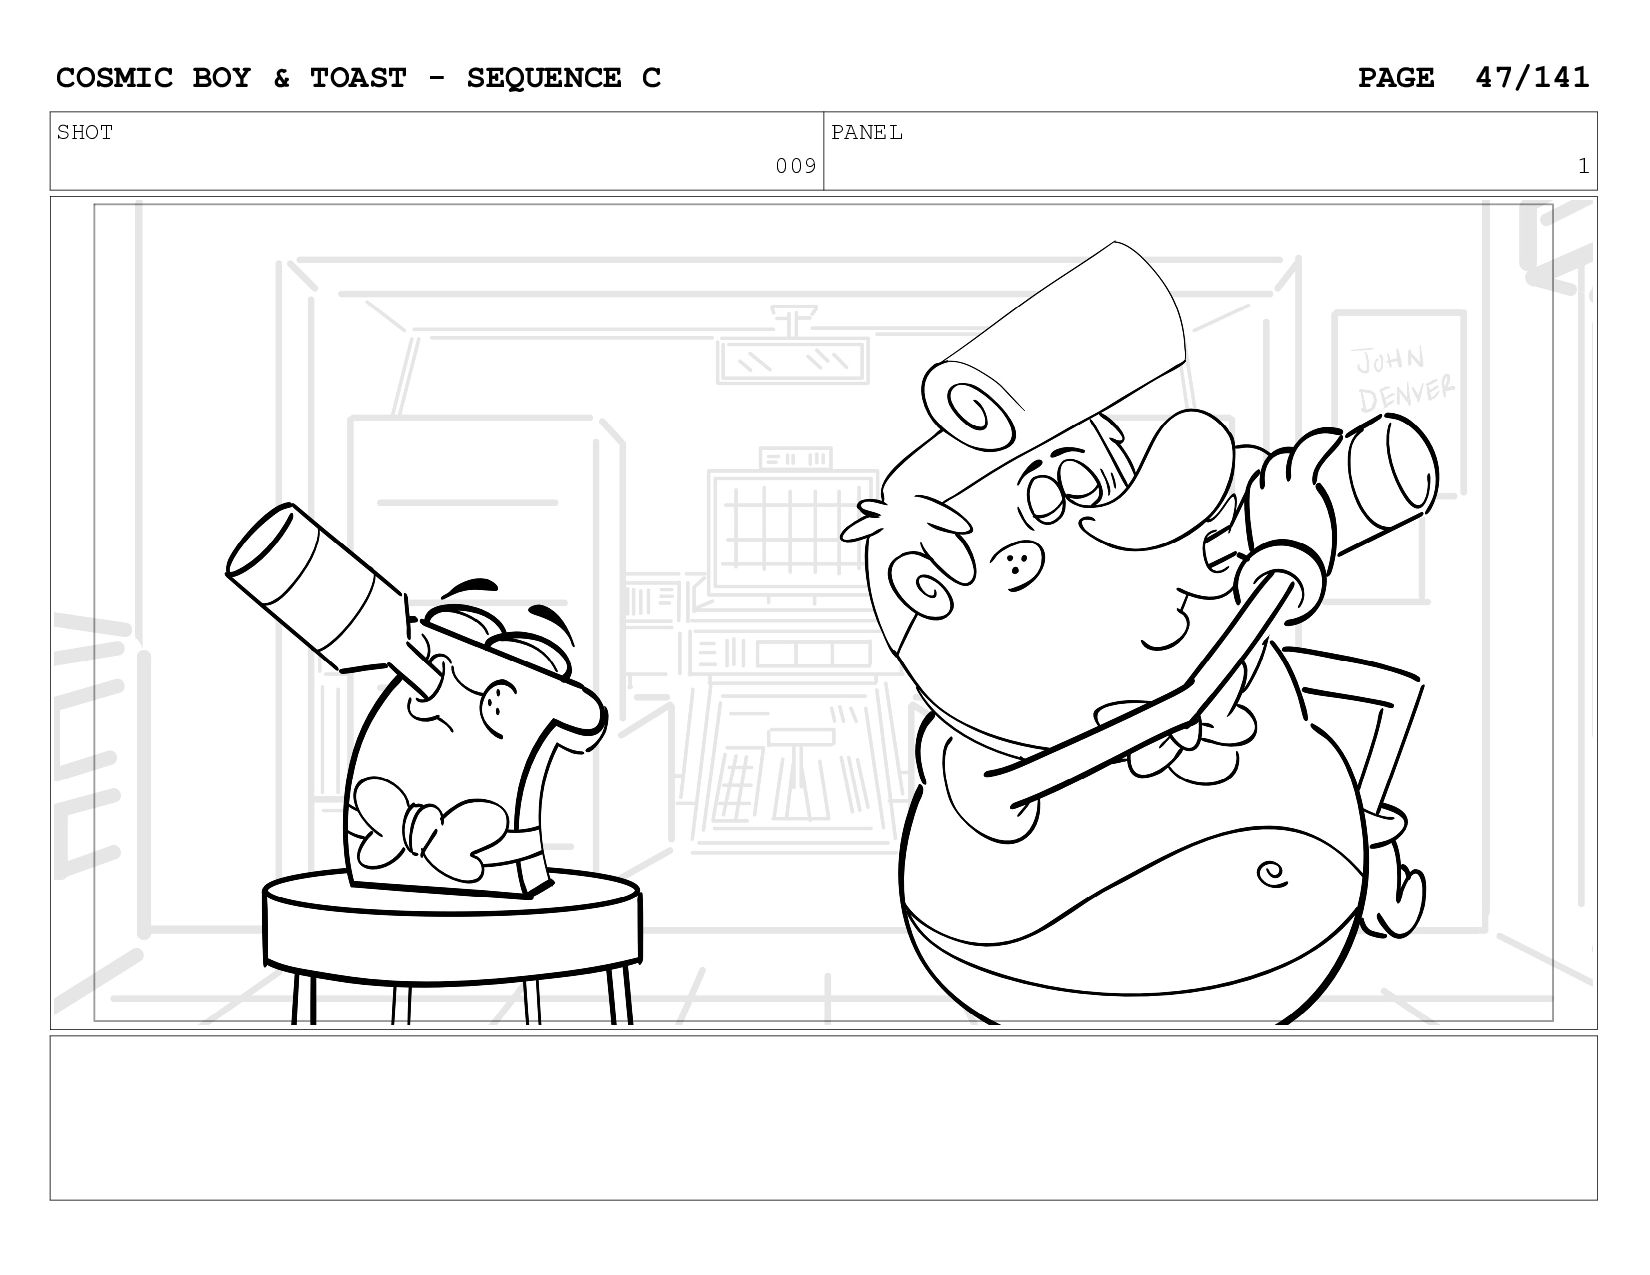 SCENE 009 PANEL A COSMIC BOY & TOAST - SEQUENCE...